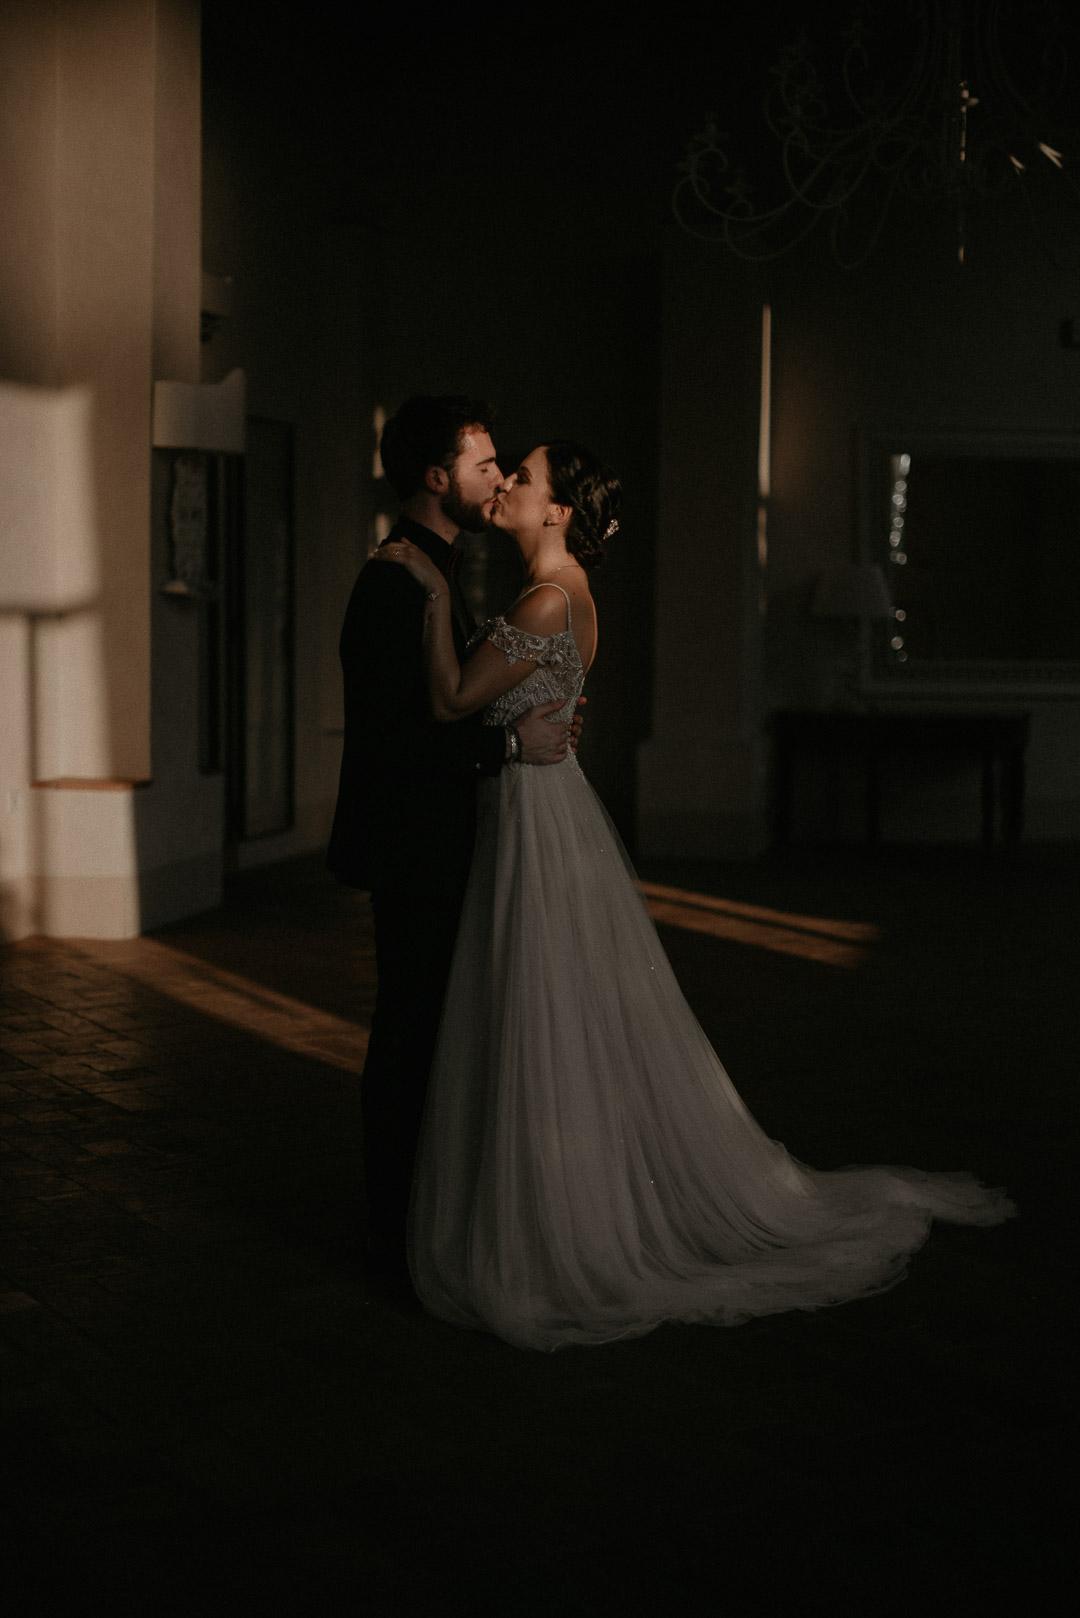 wedding-photographer-destination-fineart-bespoke-reportage-tuscany-villascorzi-vivianeizzo-spazio46-120